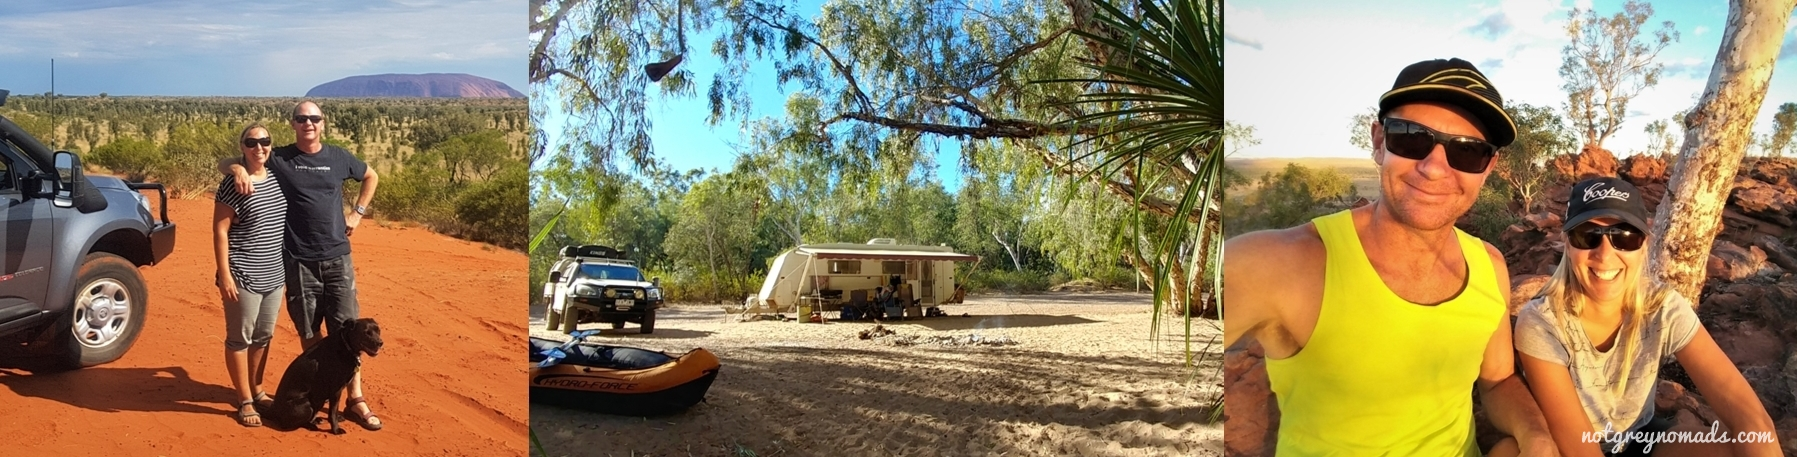 Destinations around Australia and Caravanning